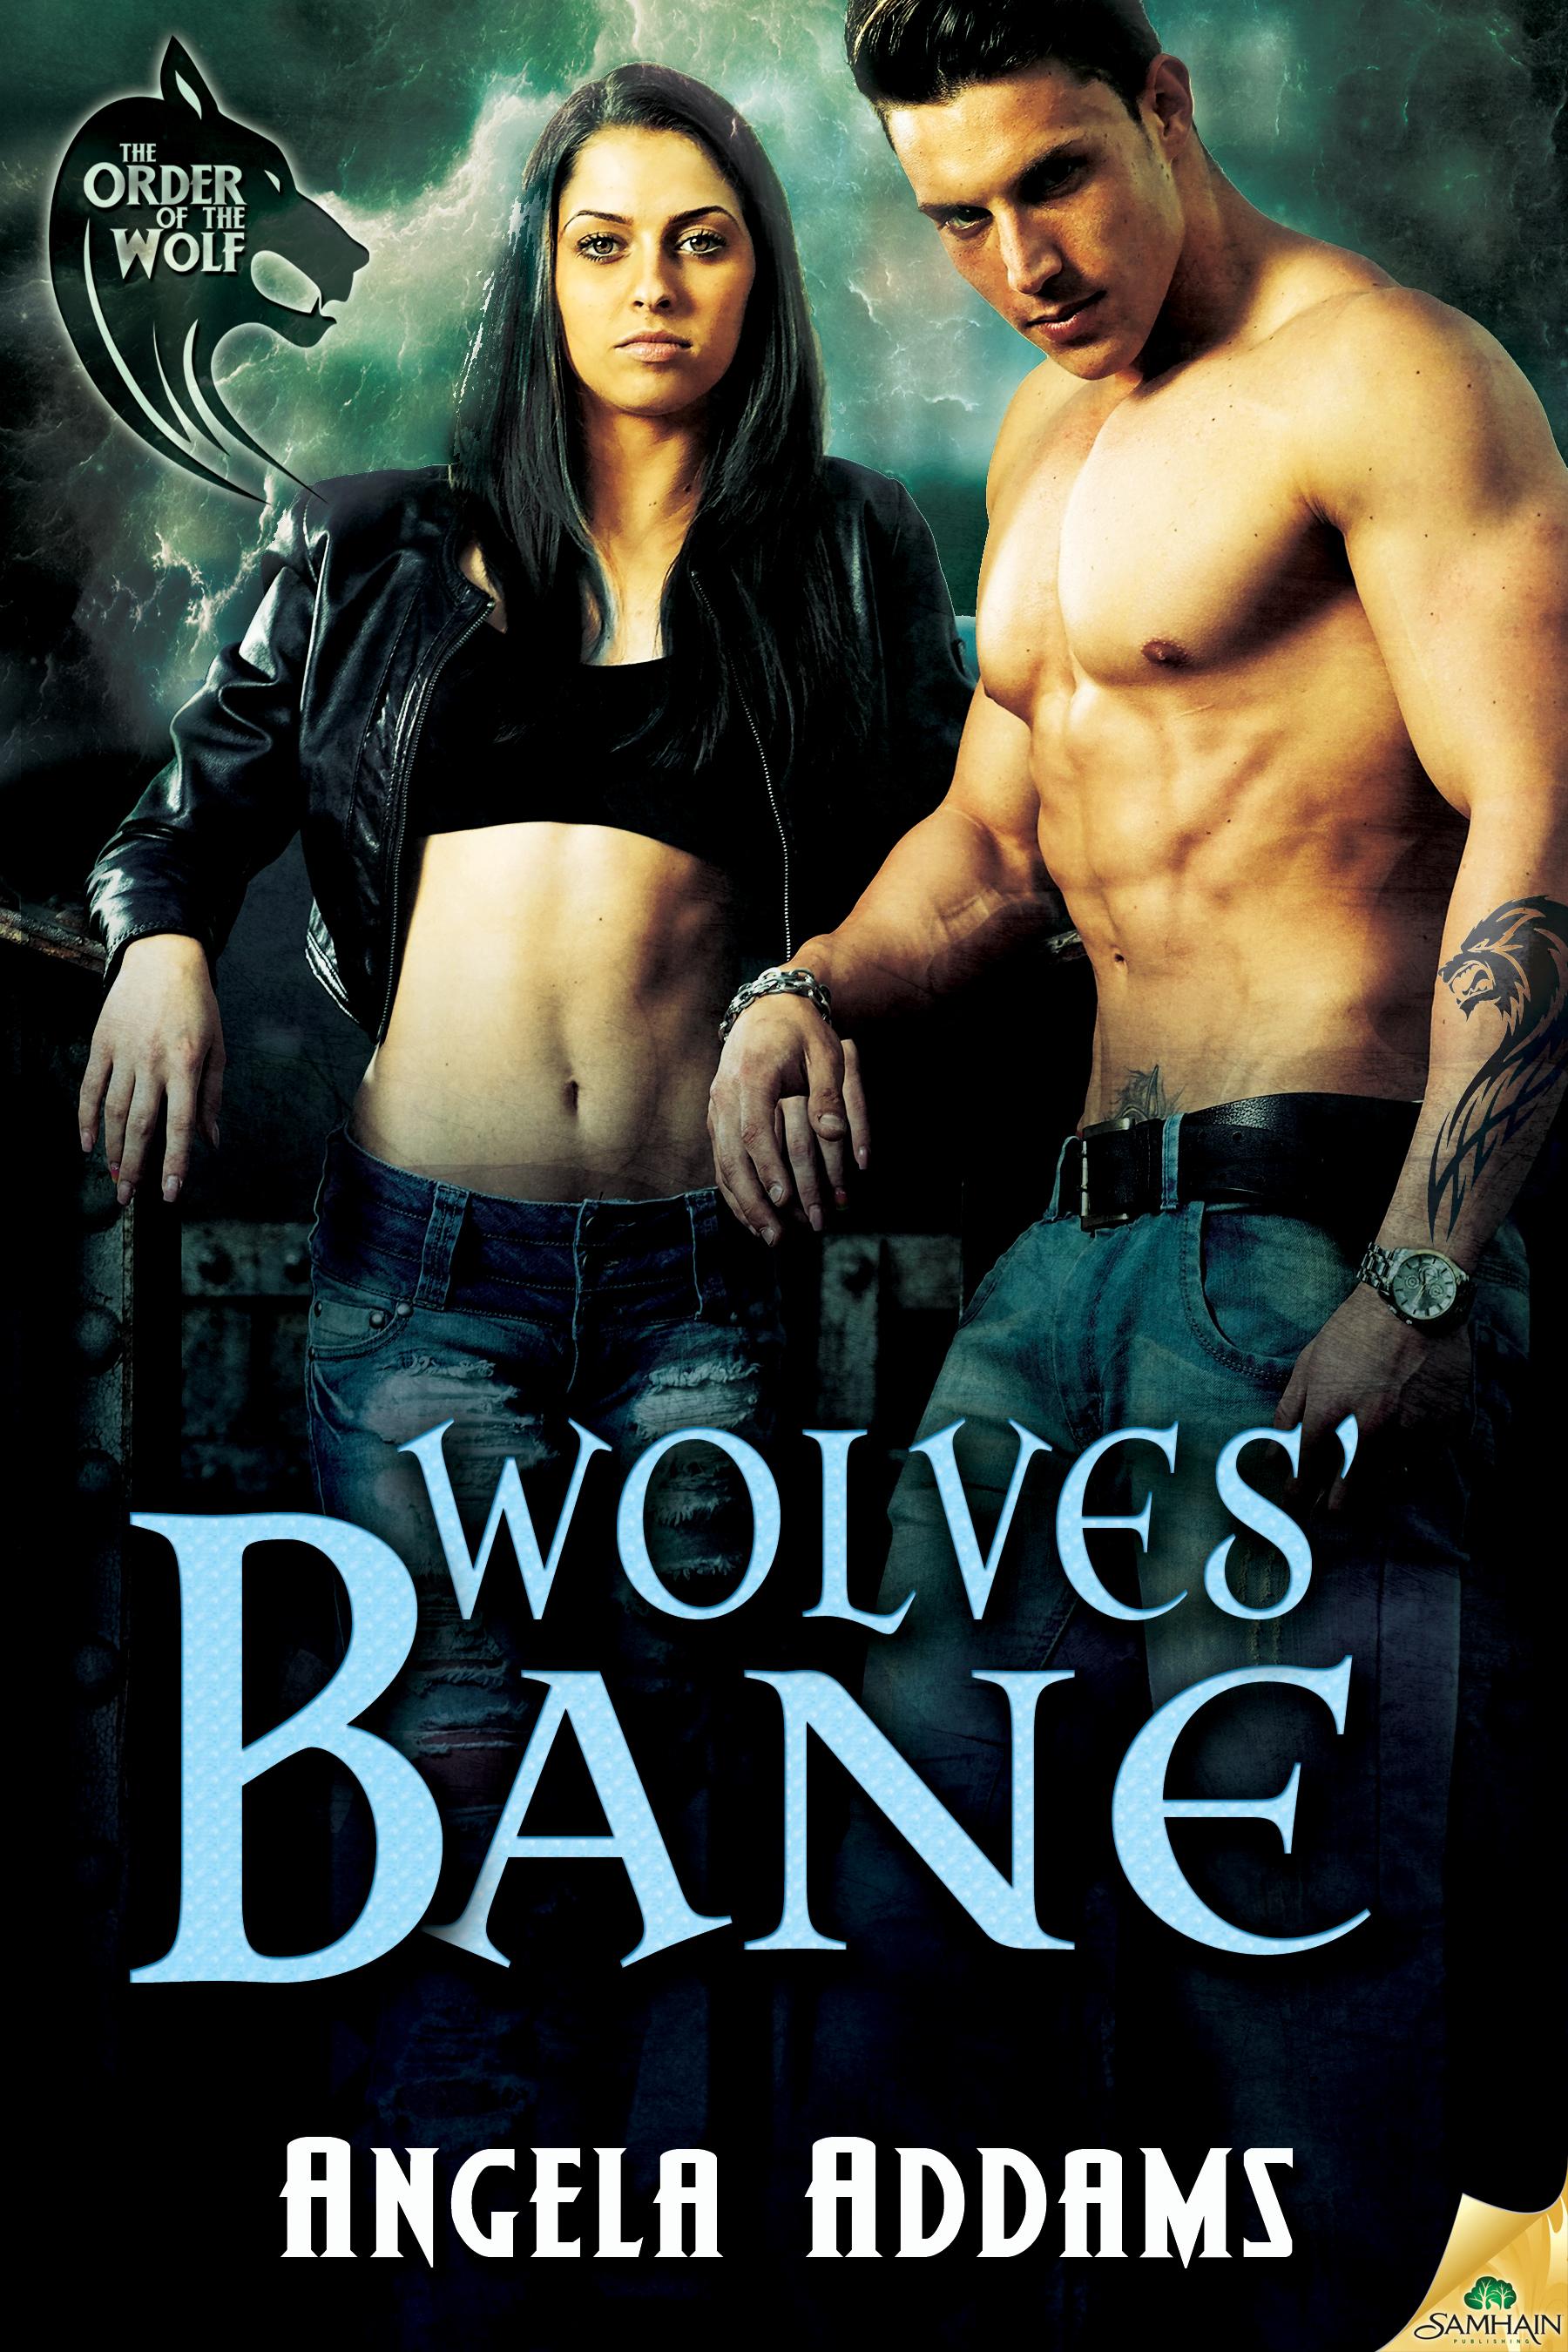 WolvesBane300